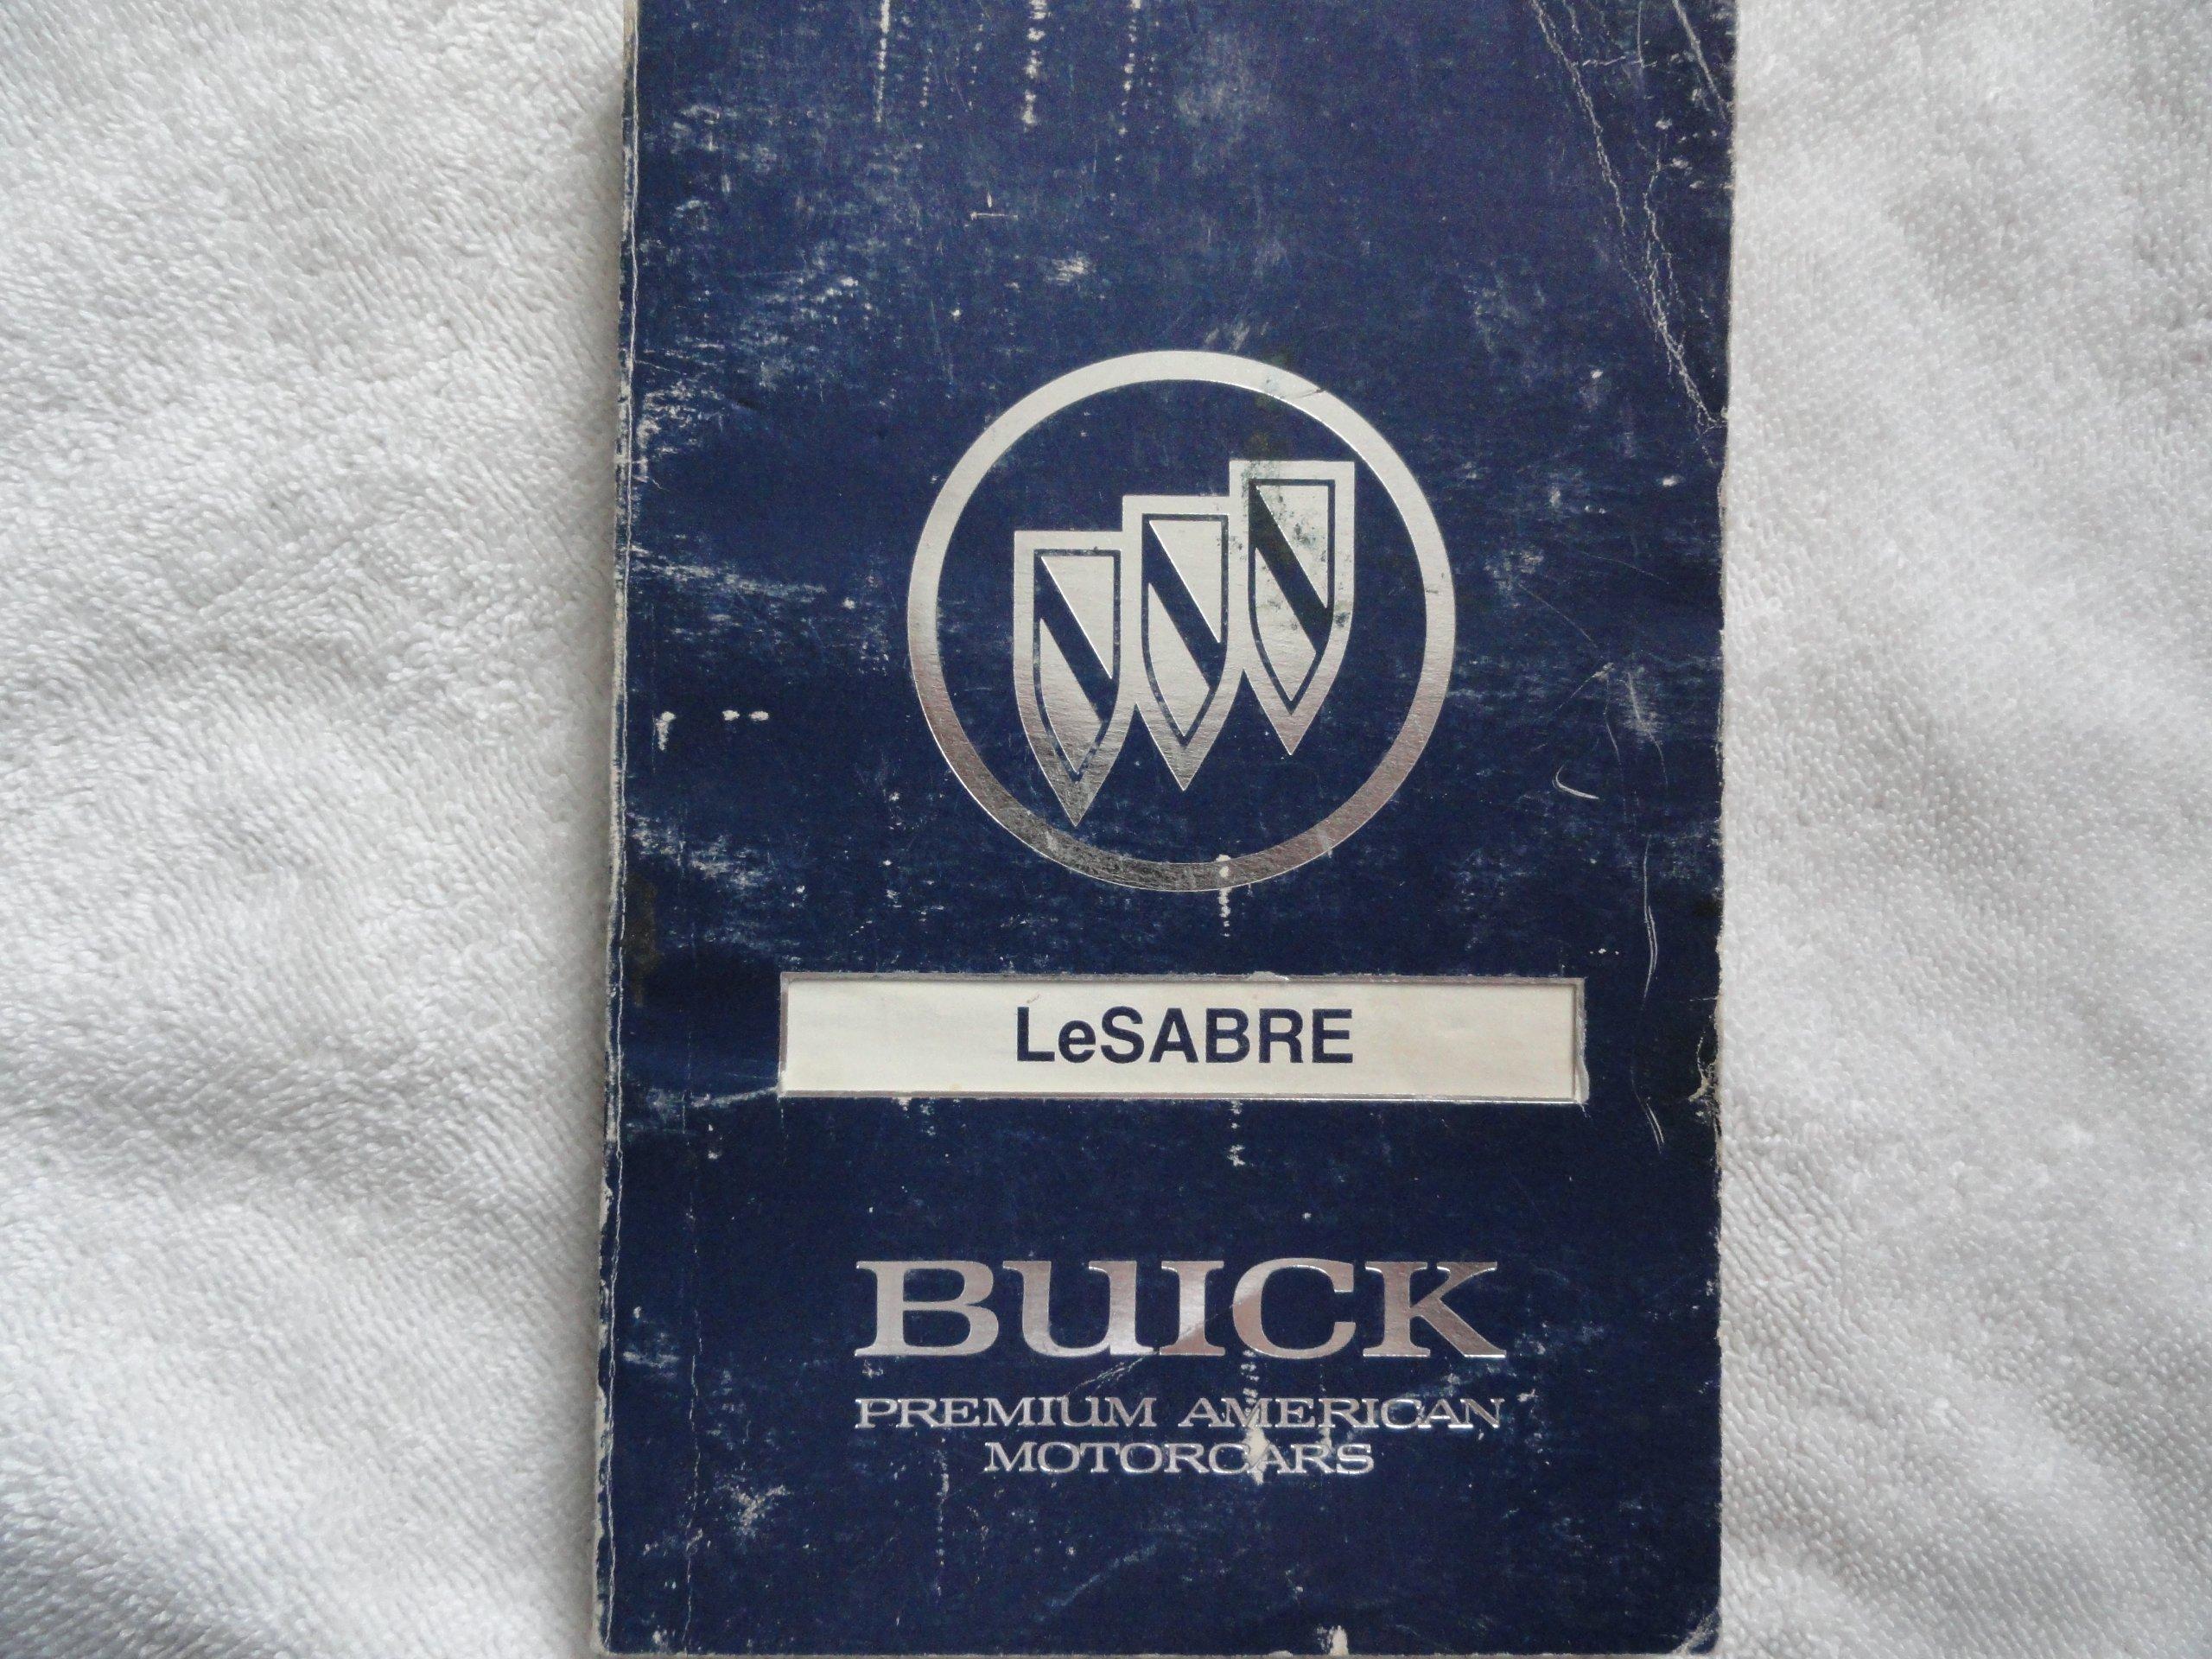 1990 buick lesabre owners manual buick amazon com books rh amazon com 1990 buick lesabre repair manual 1989 Buick LeSabre